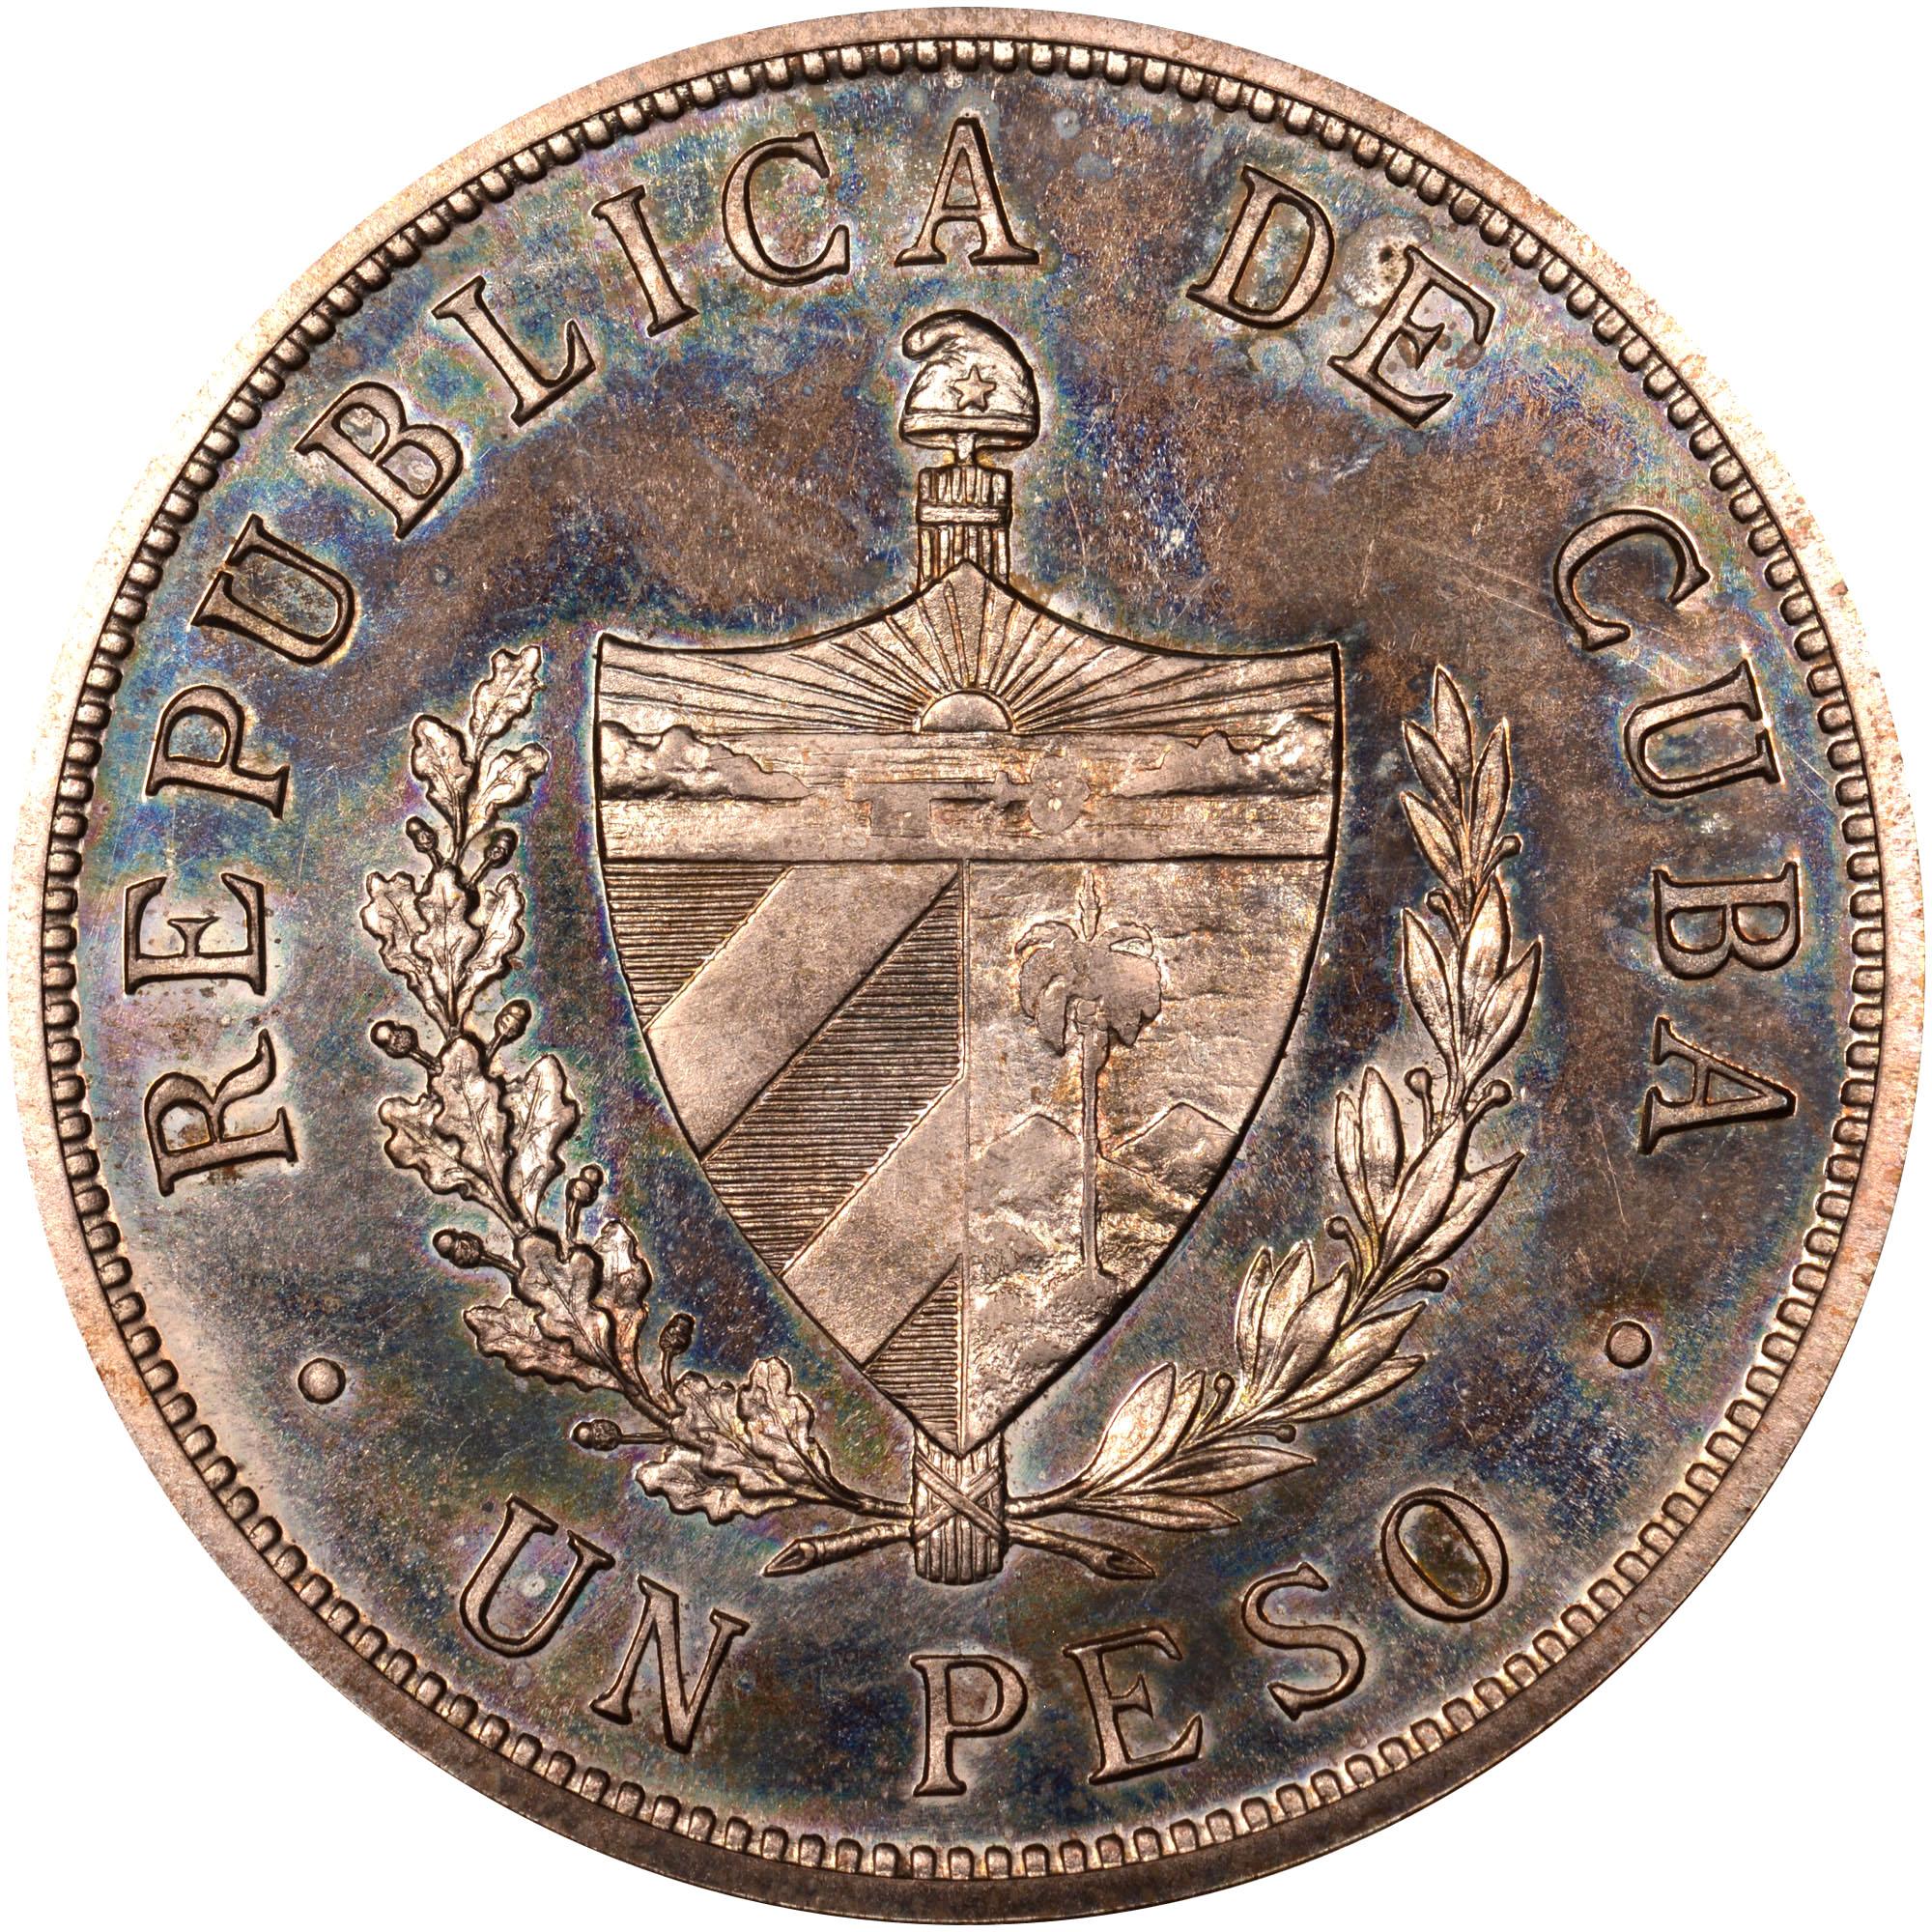 1915 Cuba Peso obverse